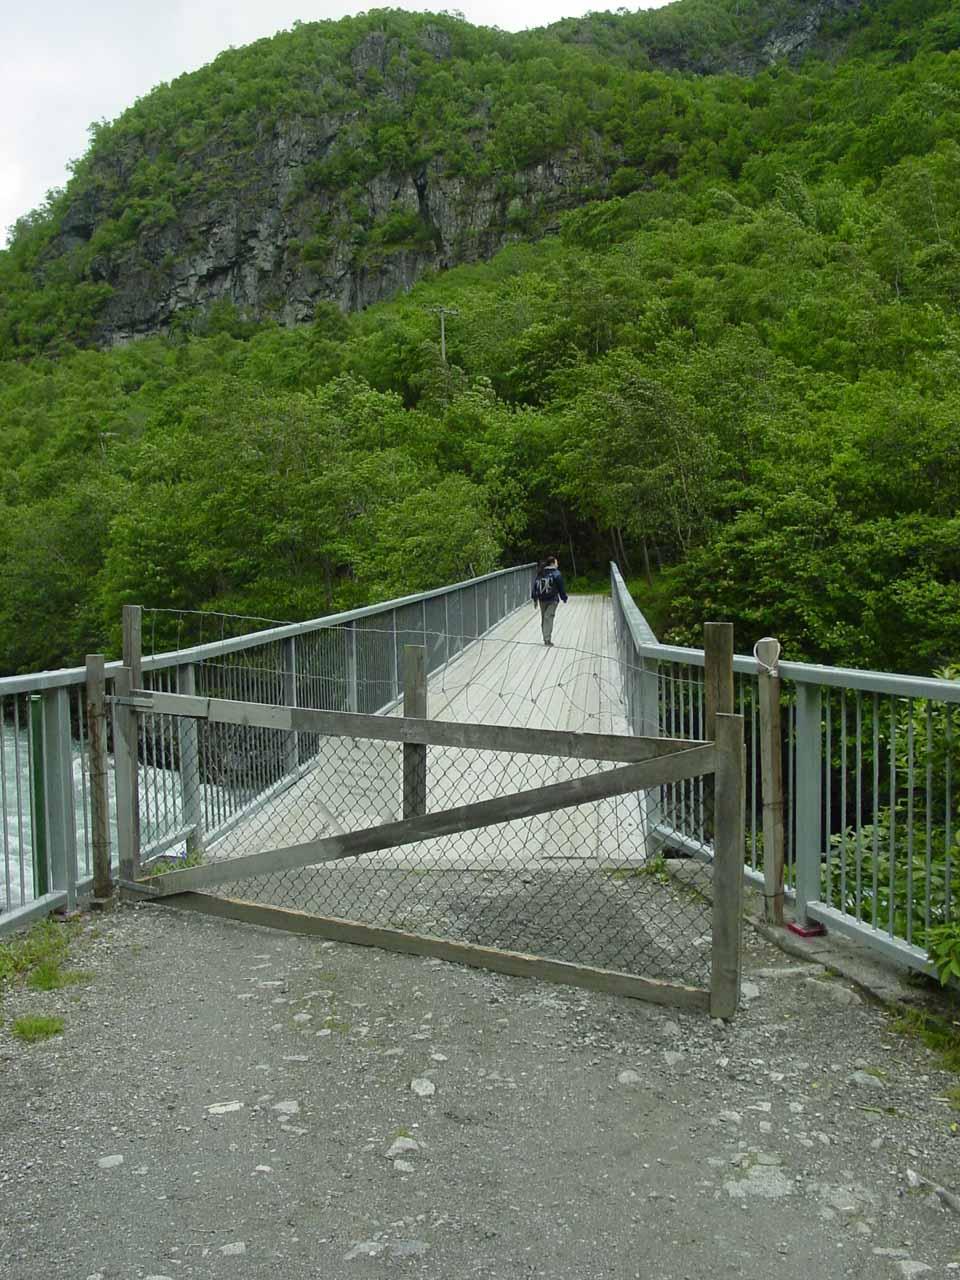 The gated bridge